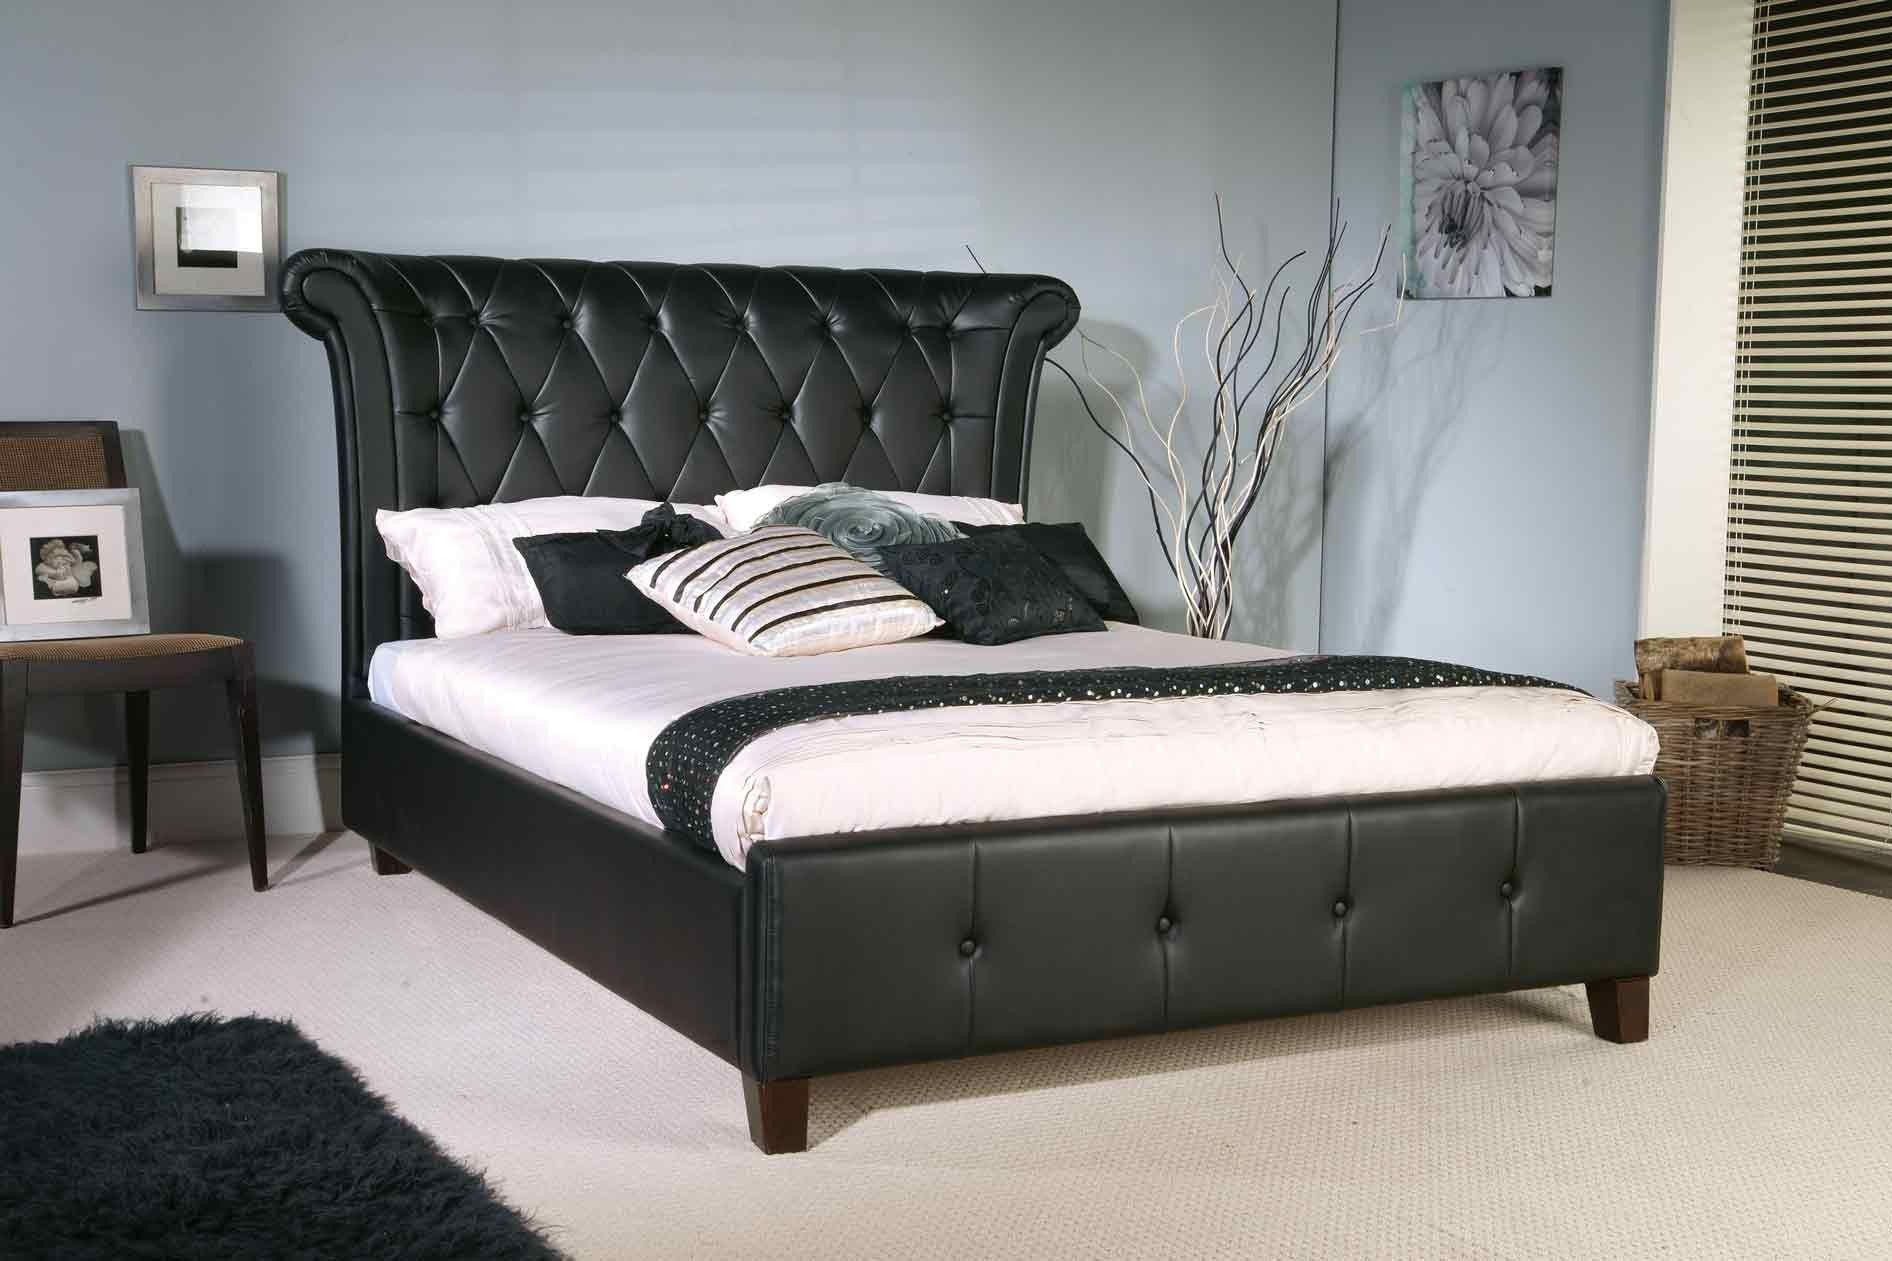 Epsilon Black Bed | Bedroom Furniture ideas. | Pinterest